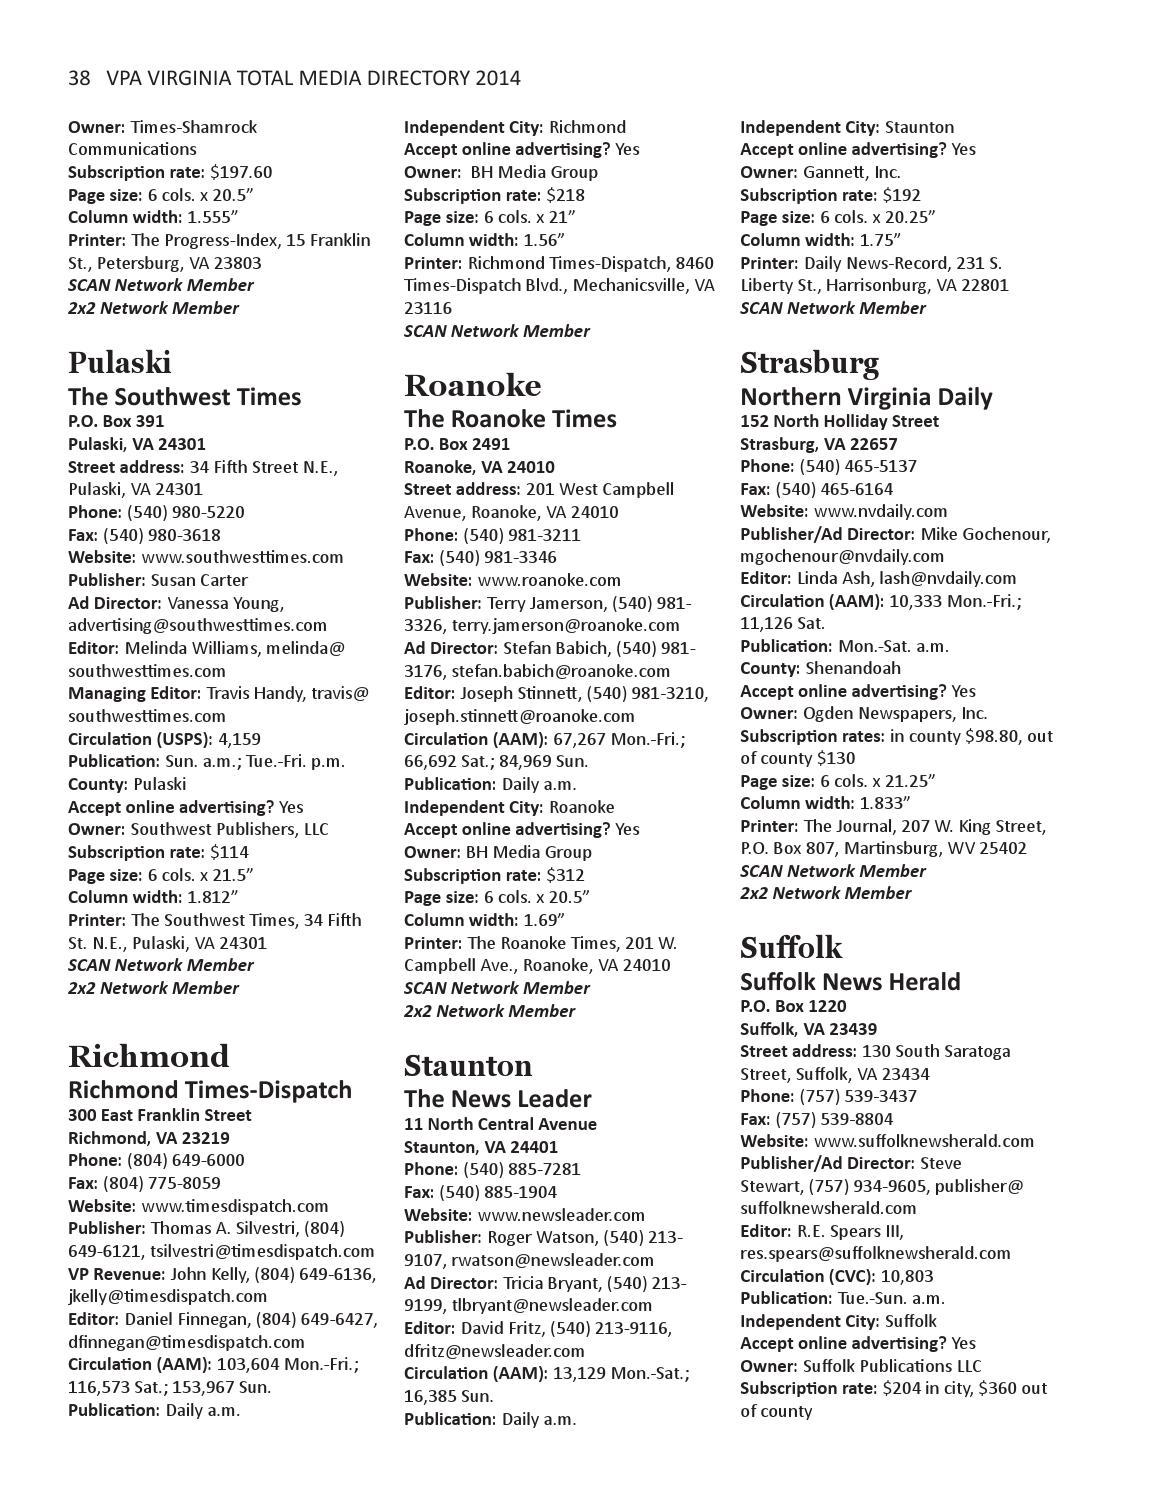 2014 Virginia Total Media Directory by vapress - issuu